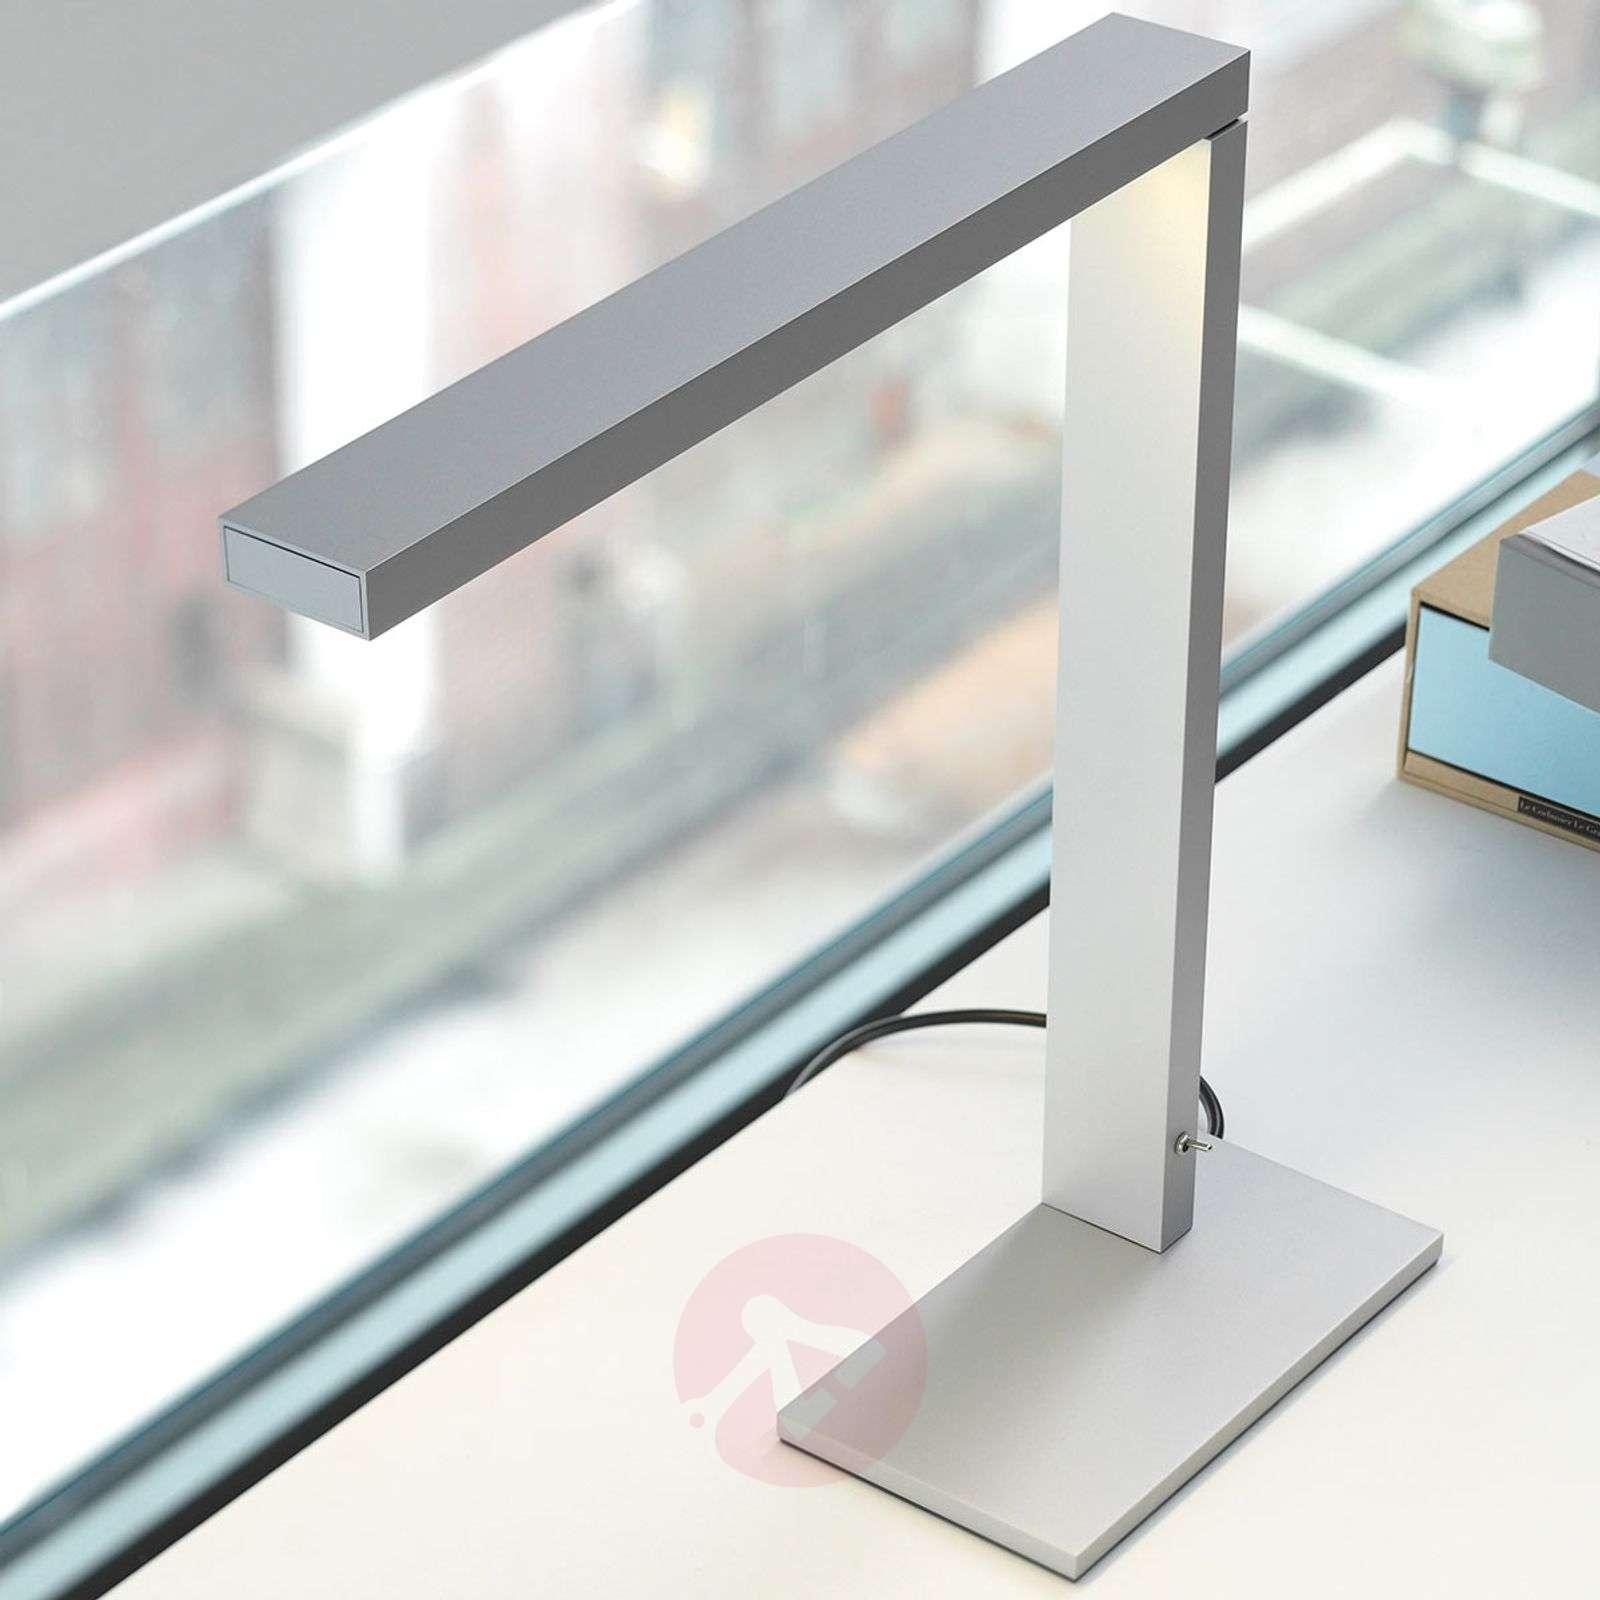 Moderni jäykkävartinen LED-pöytävalaisin Zac BL-1071081-01